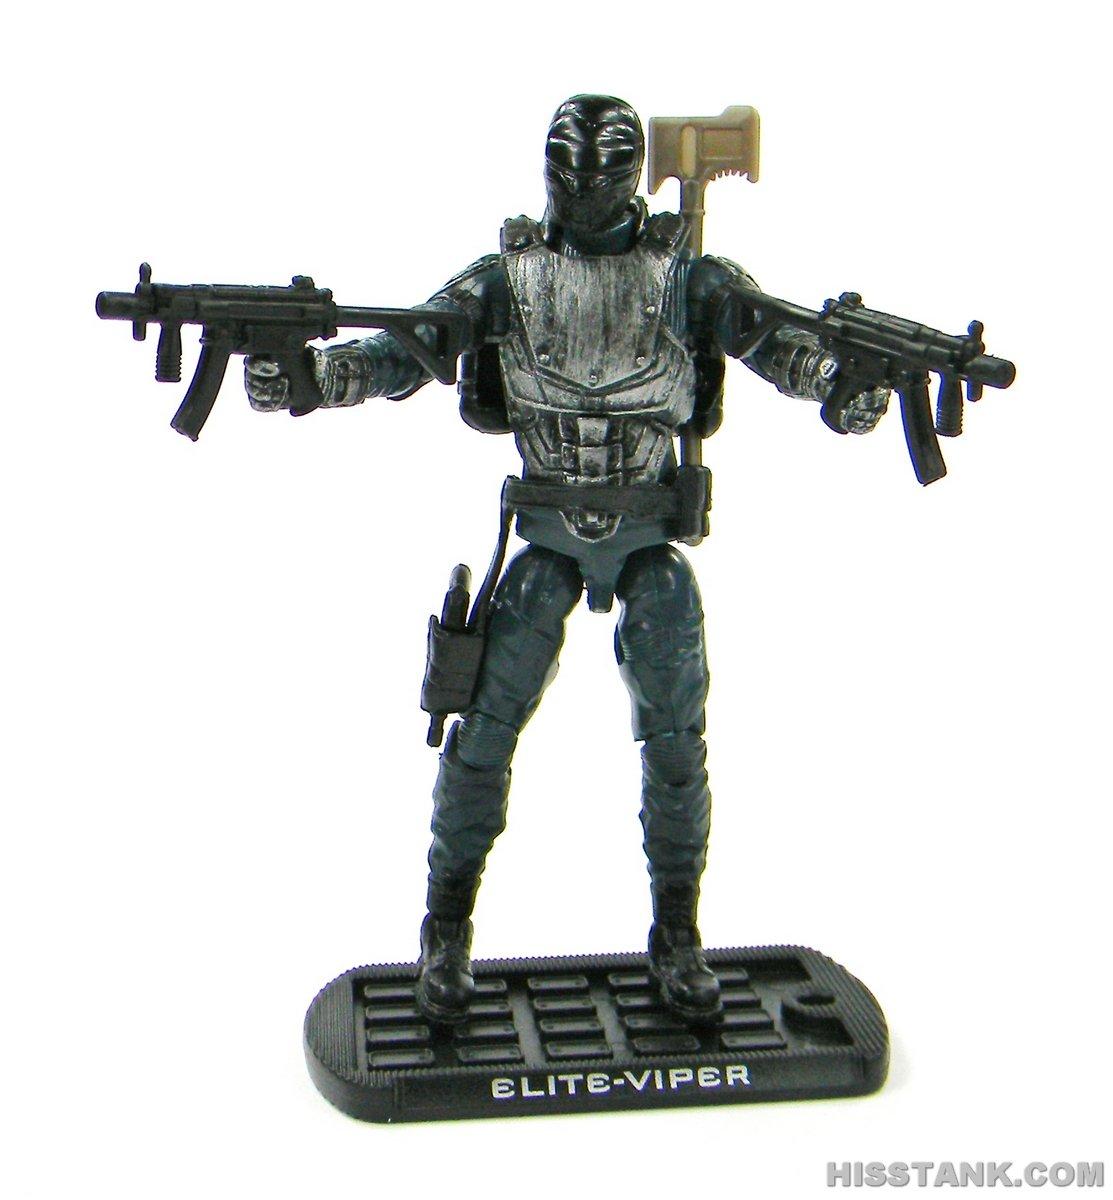 008Elite-Viper-Rex-ROC - G I  Joe Database